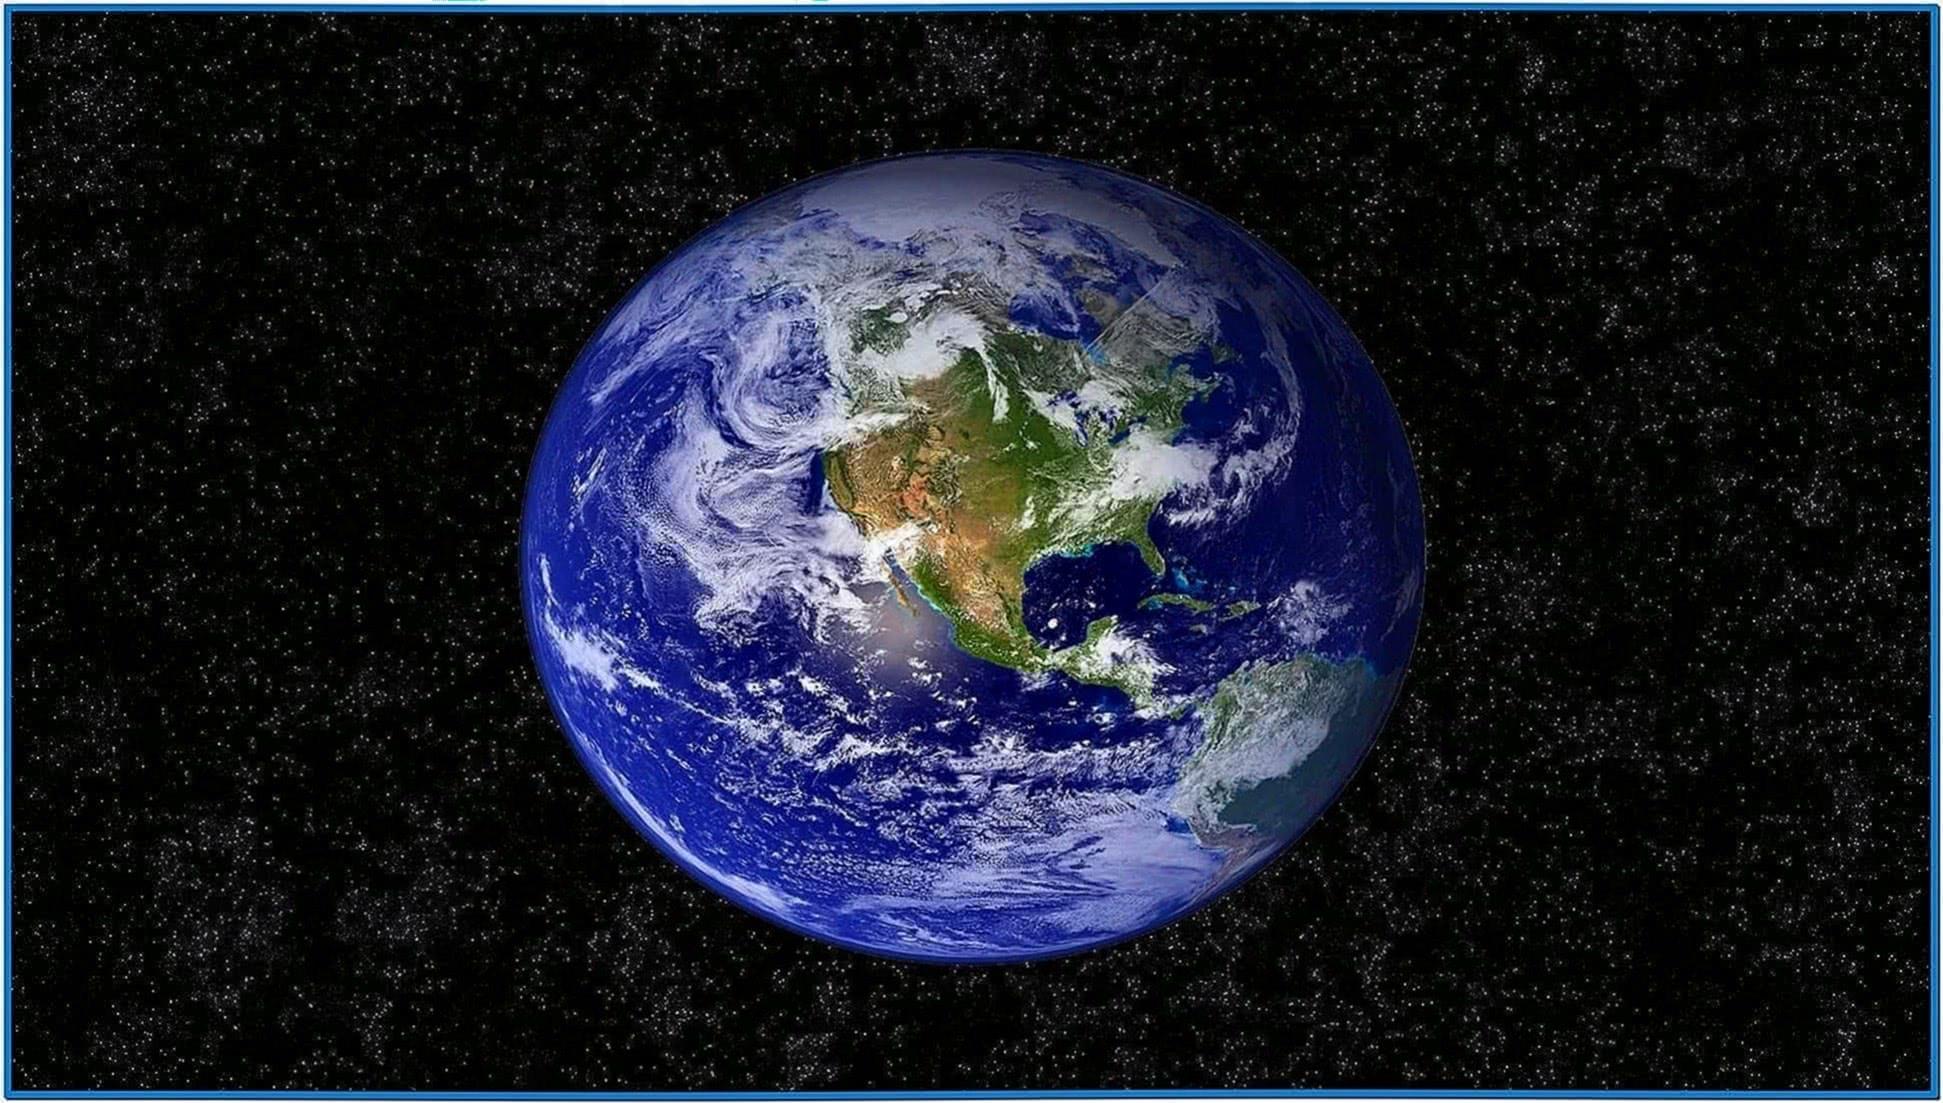 Earth Screensaver PS3